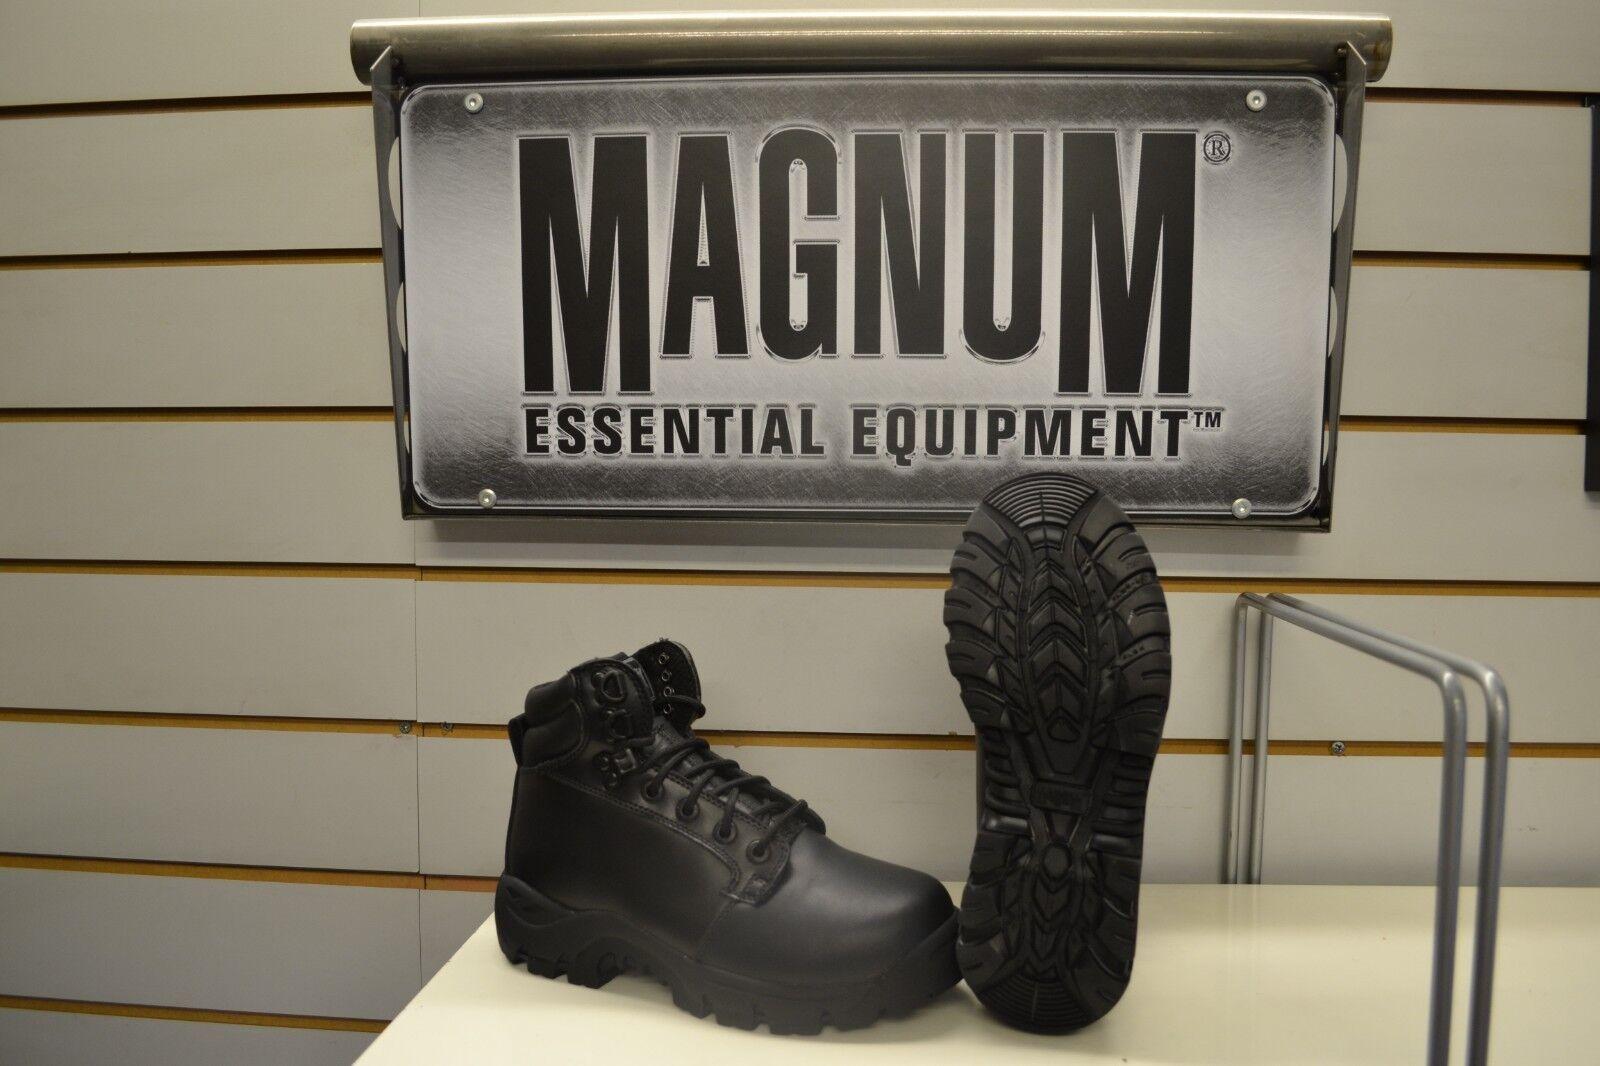 Magnum Patrol ST Black Leather Steel Toe Safety Boots UK 3.5 EU 36 Deadstock